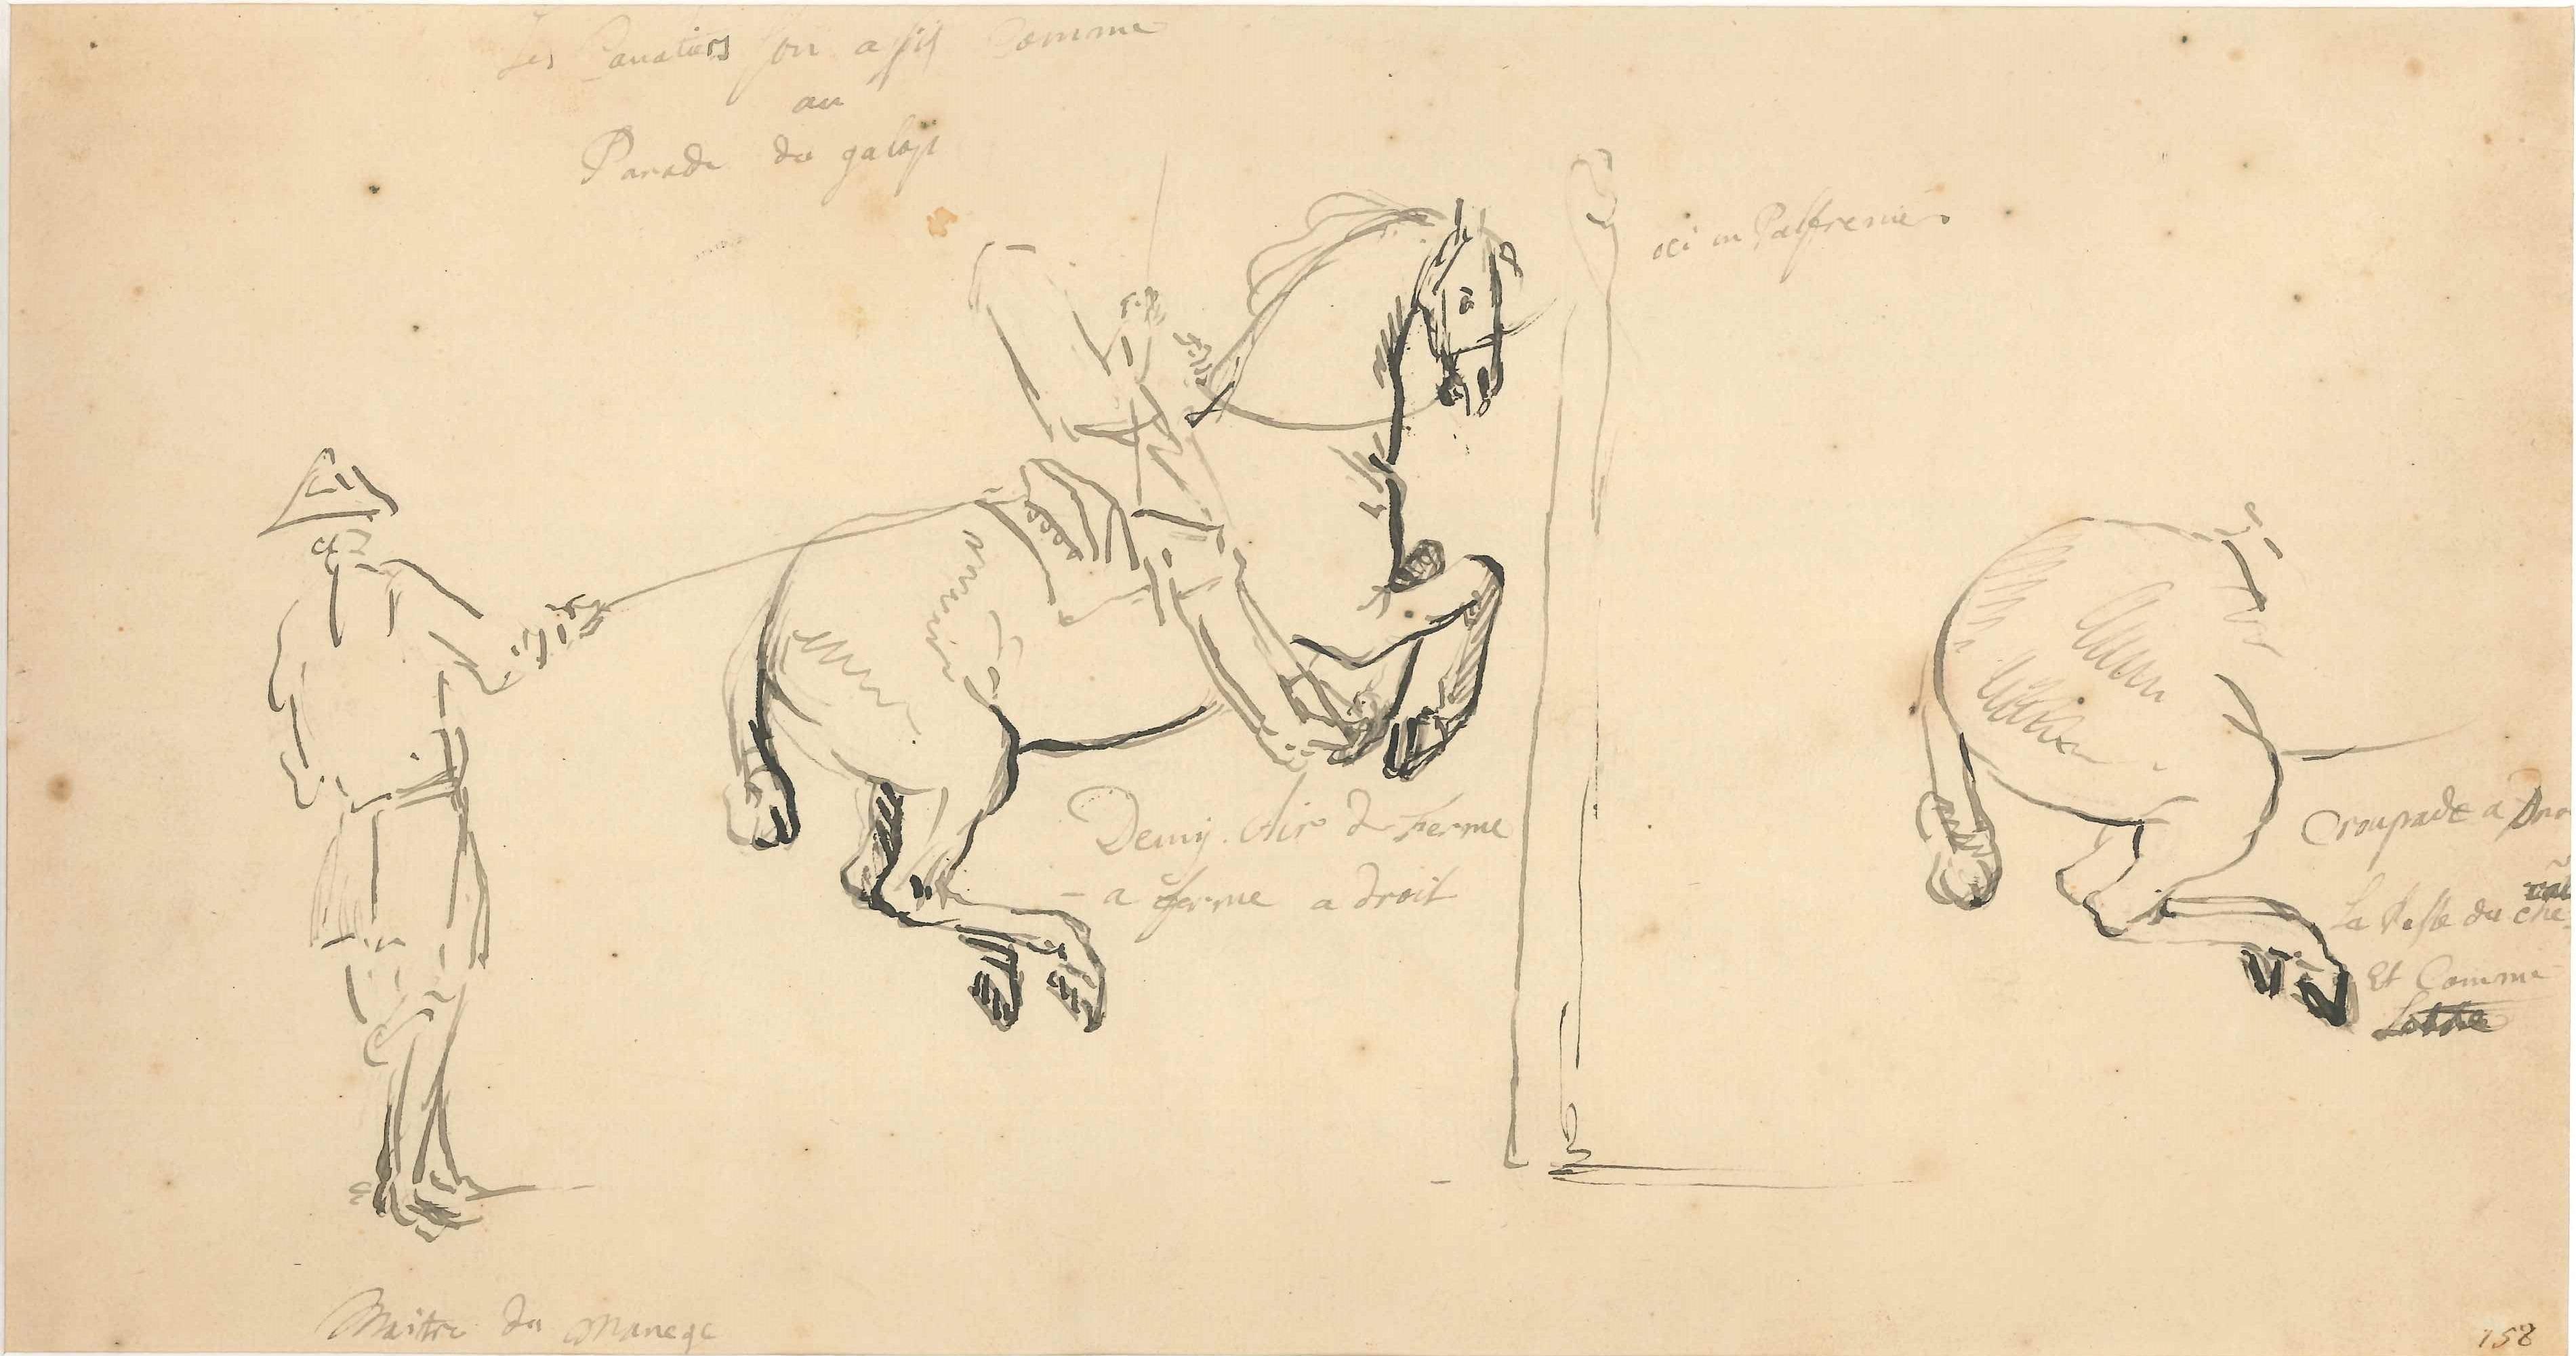 Riding School - Original China Ink Drawing by Jan Pieter Verdussen - Mid 1700